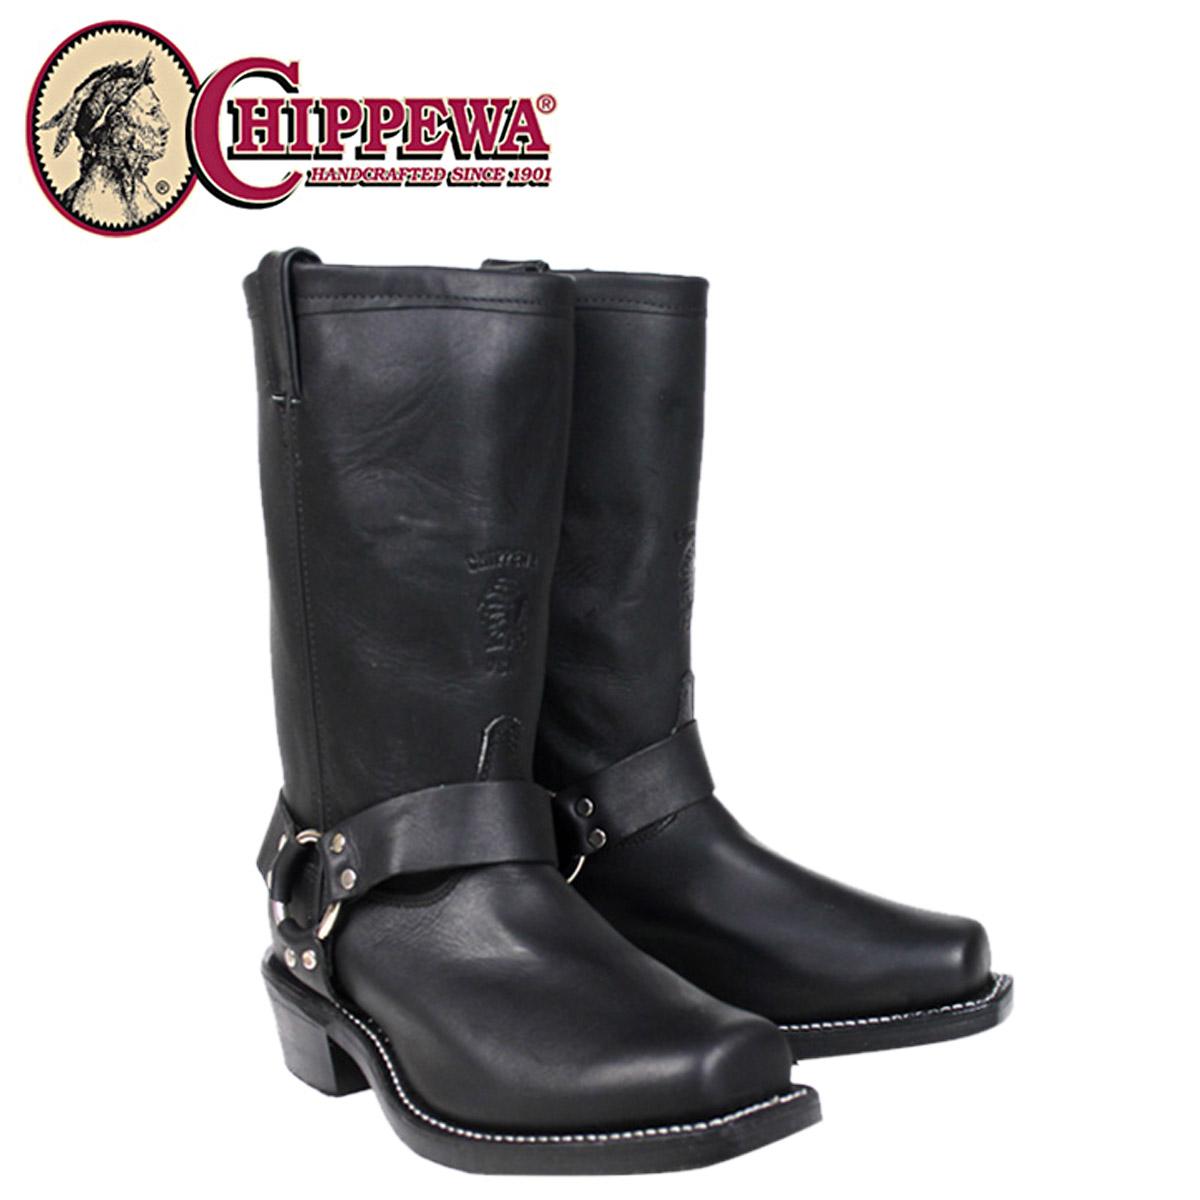 [SOLD OUT]chipewa CHIPPEWA 12英寸马具长筒靴黑色敖德萨27868 12INCH BLACK D怀斯E怀斯皮革人